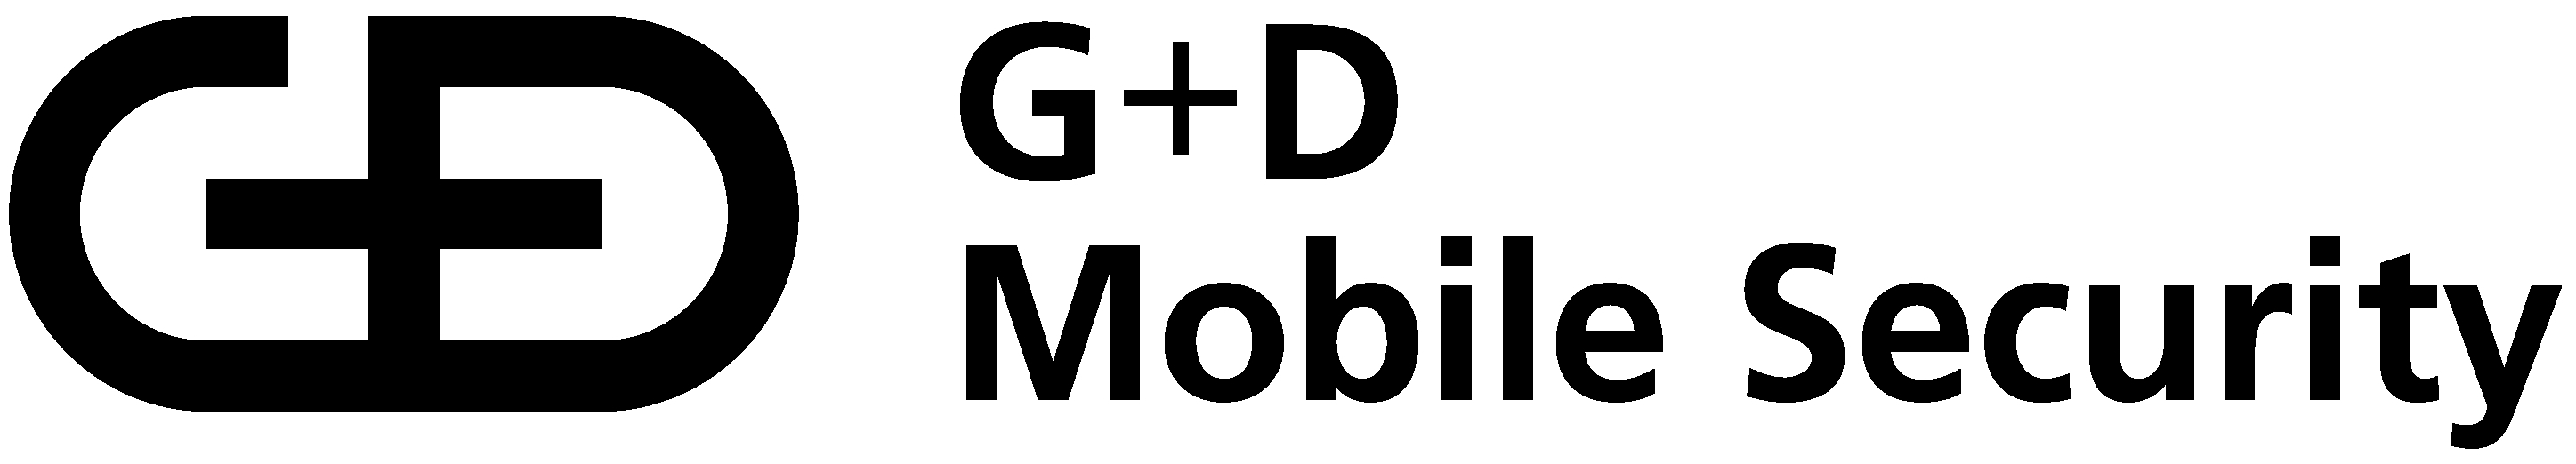 Giesecke + Devrient Mobile Security Iberia